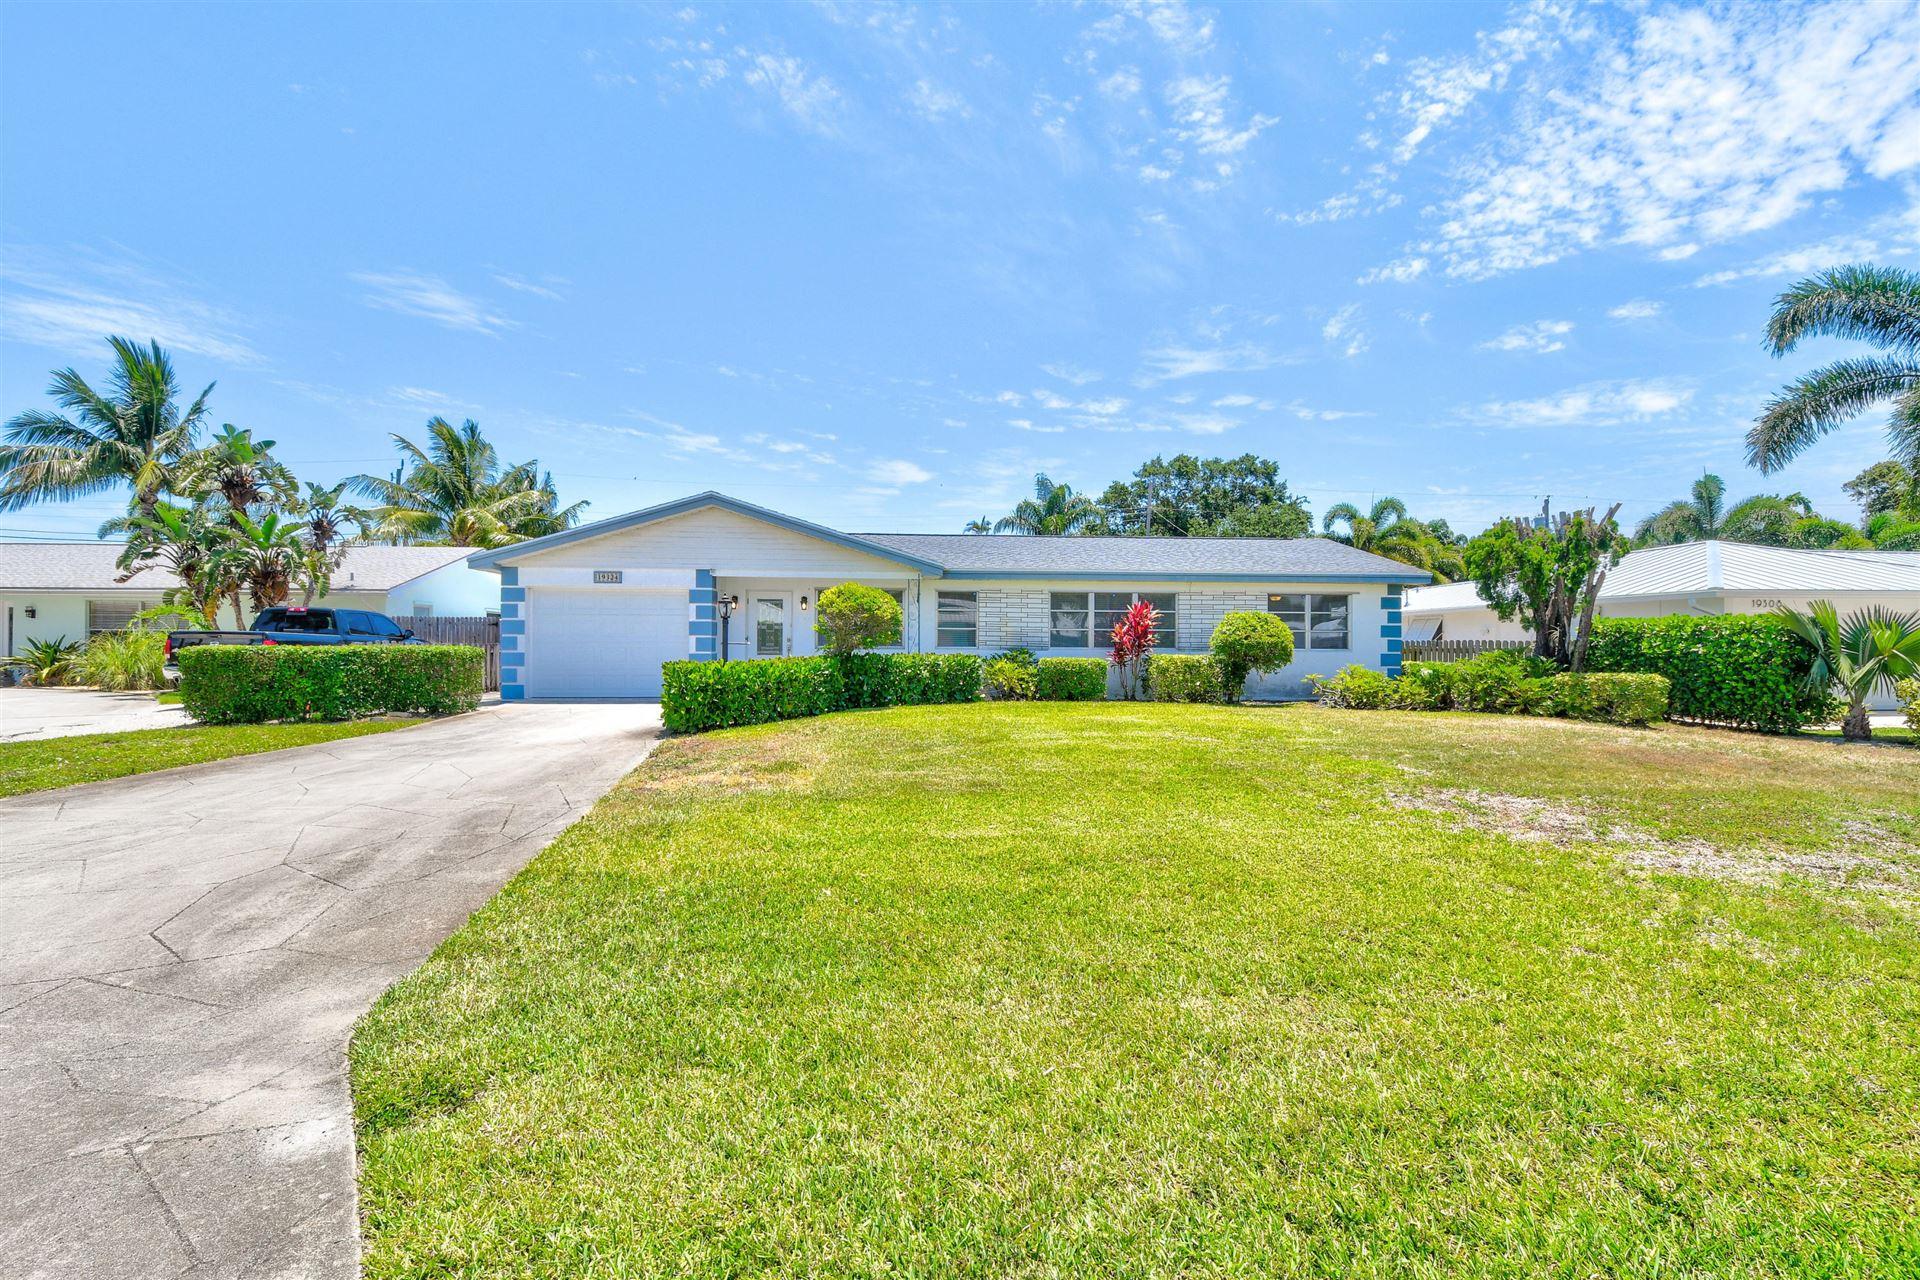 19324 Caribbean Court, Jupiter, FL 33469 - #: RX-10720582